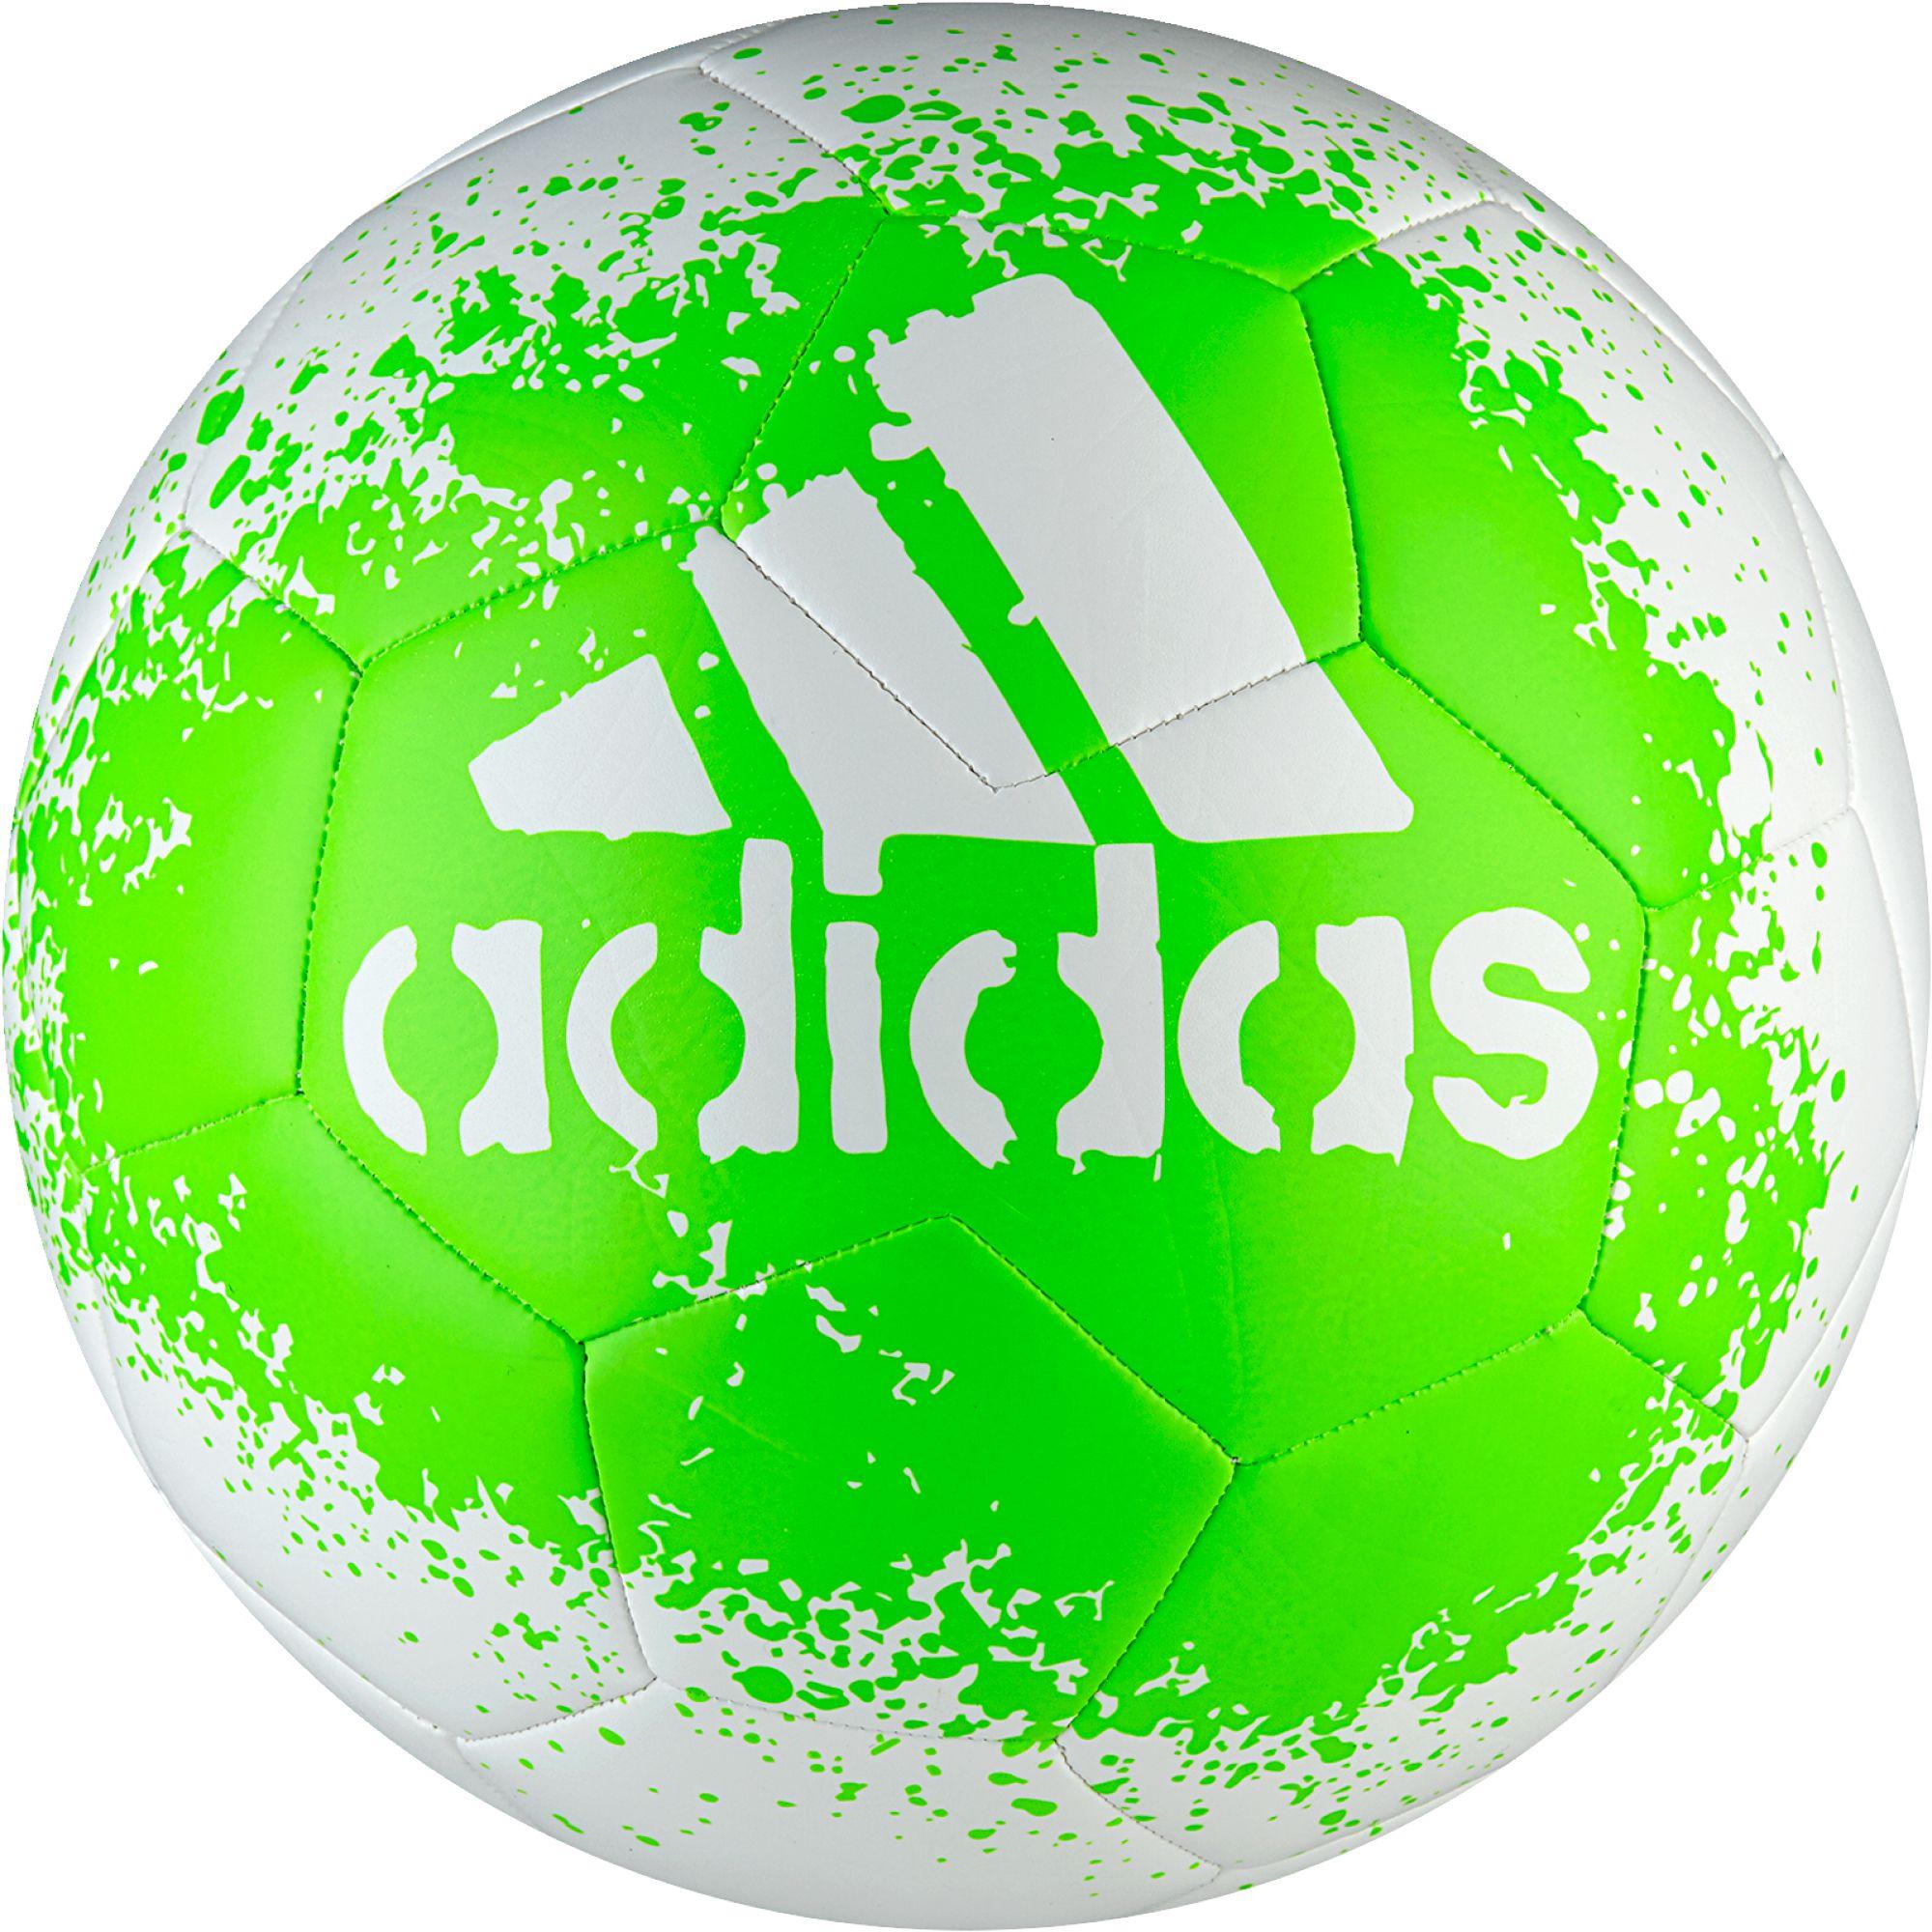 Adidas soccer ball logo